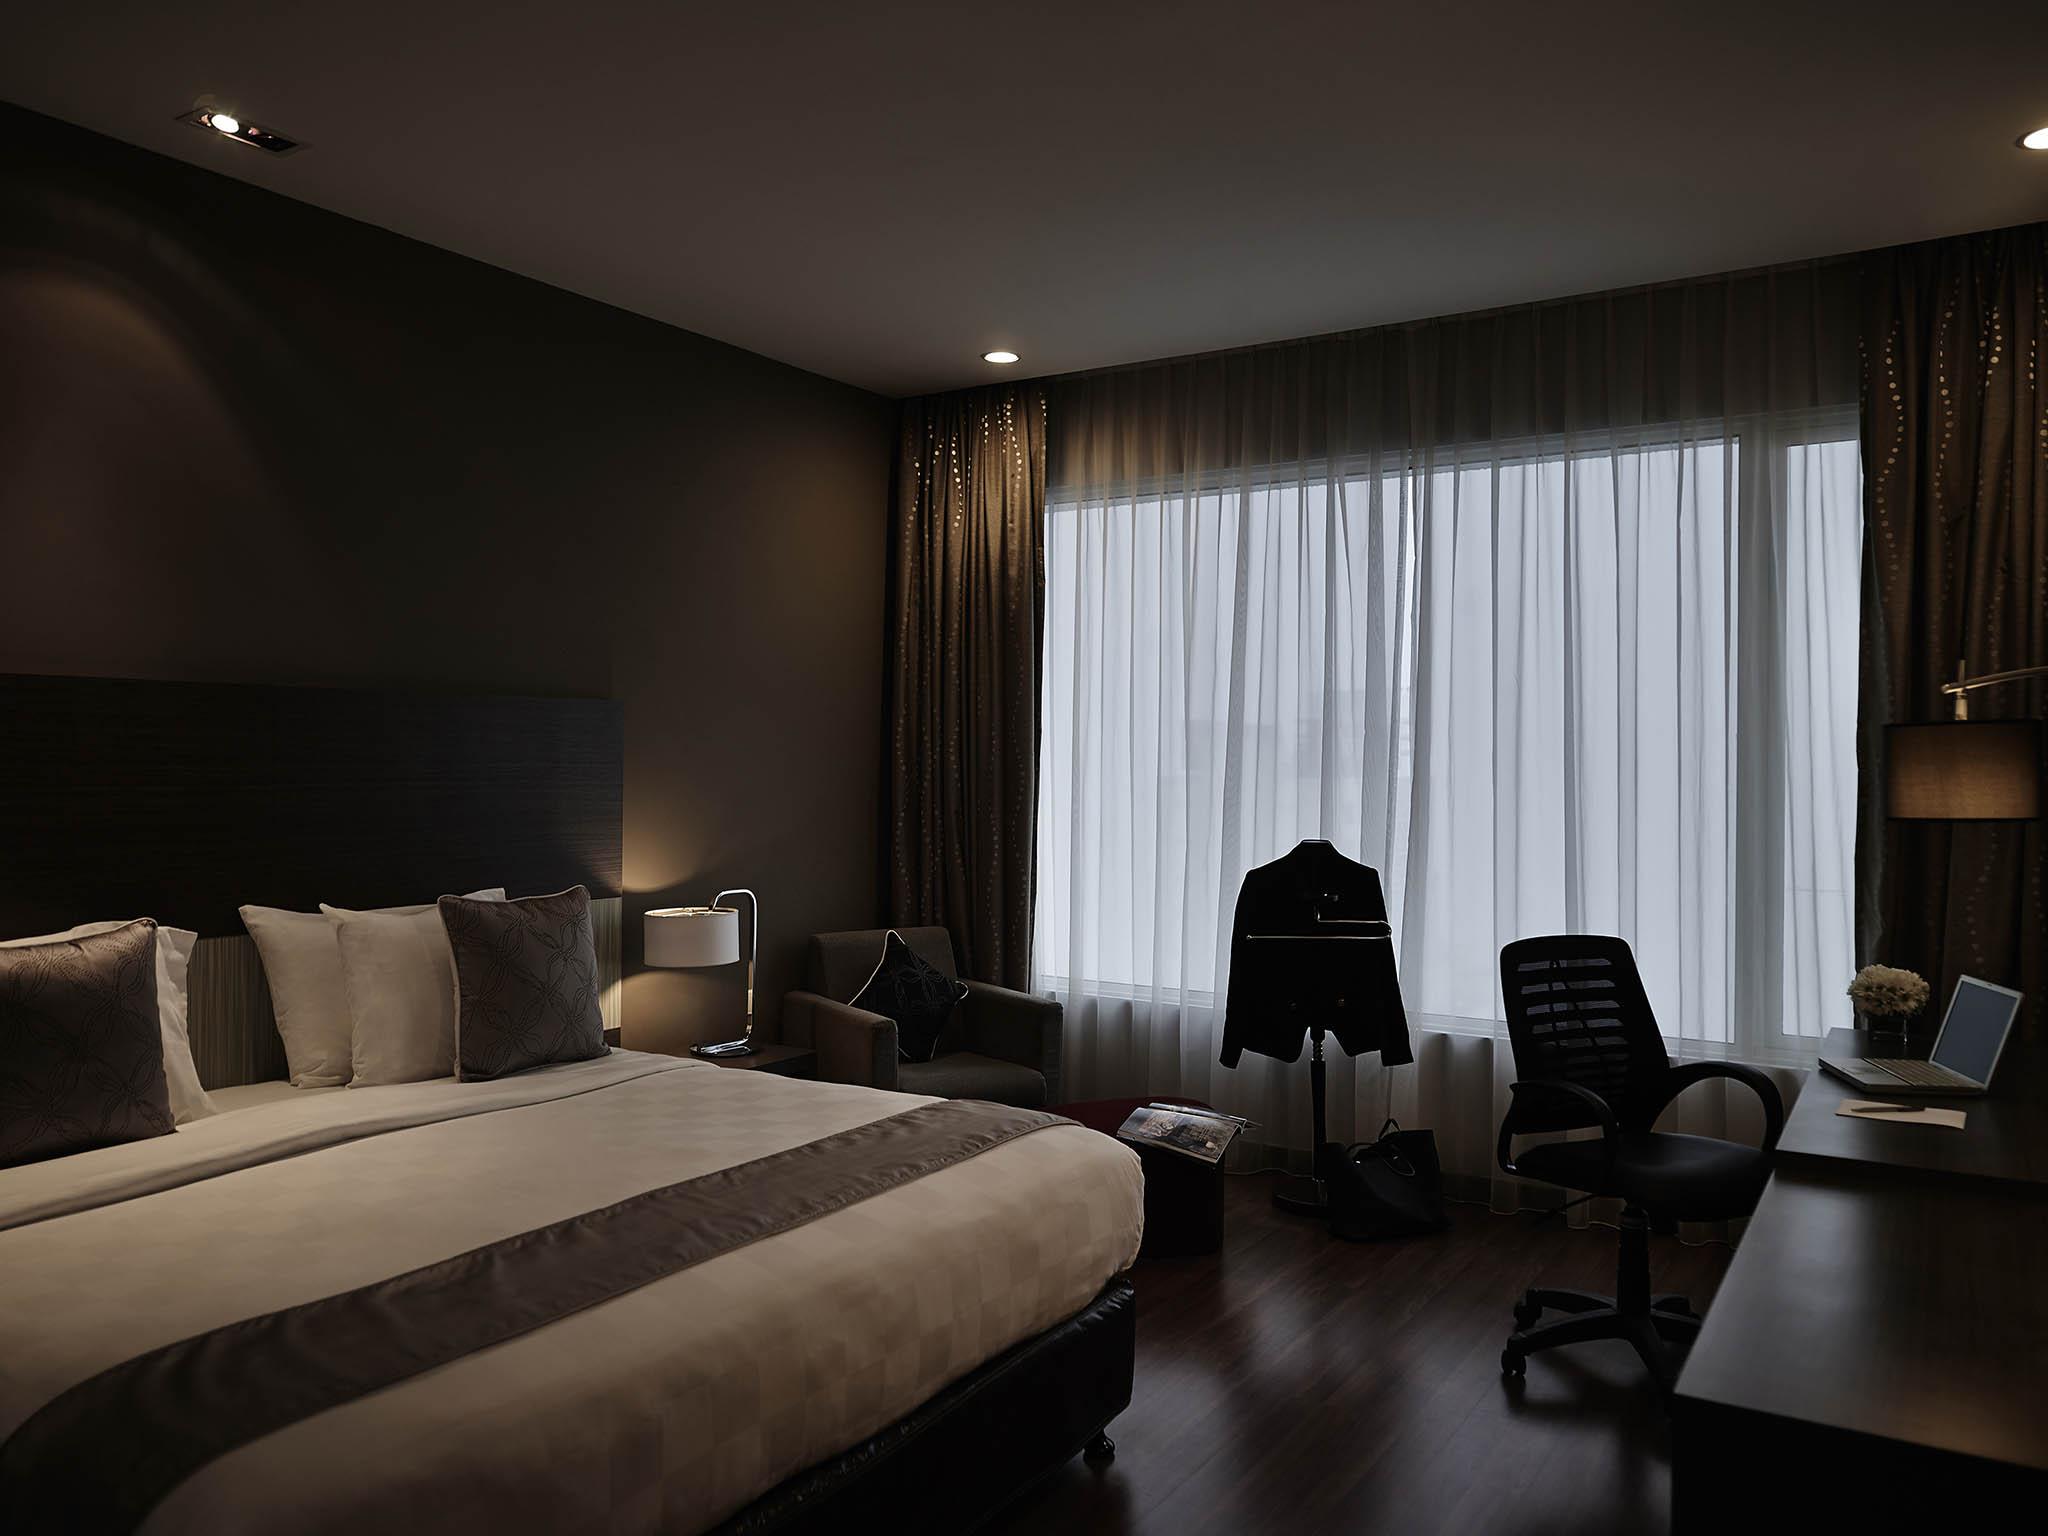 Pullman Kuching   5 star hotel in vibrant Kuching city